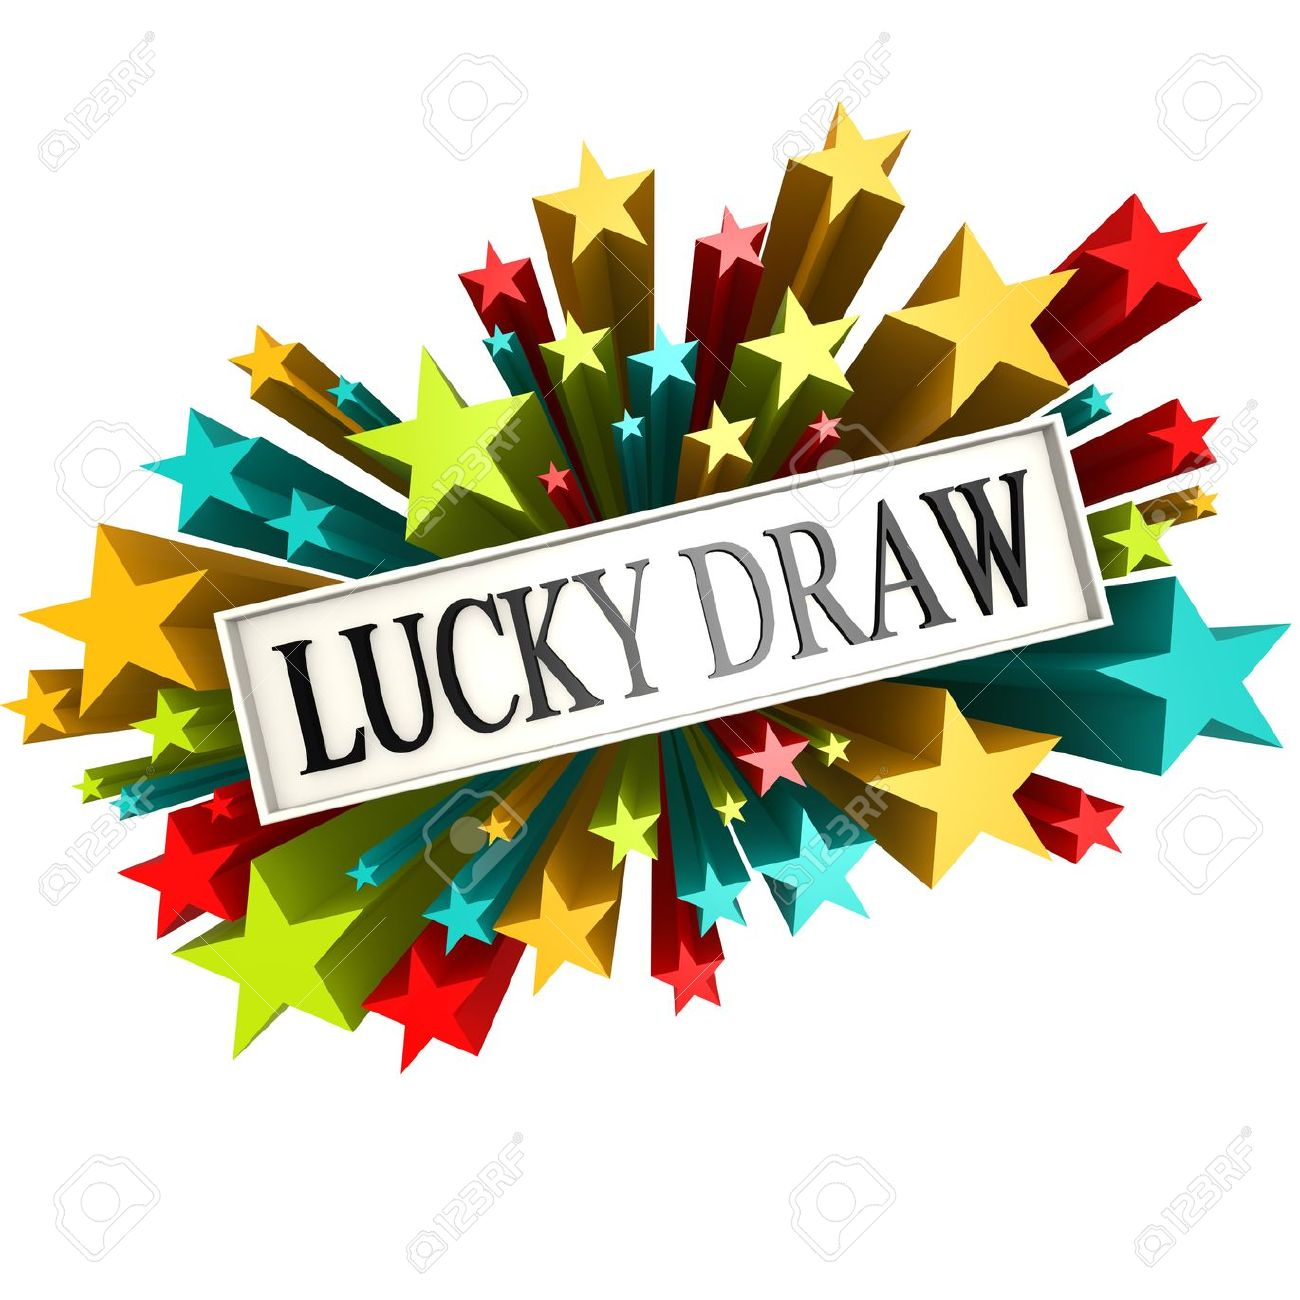 Lucky draw star banner - 34744588